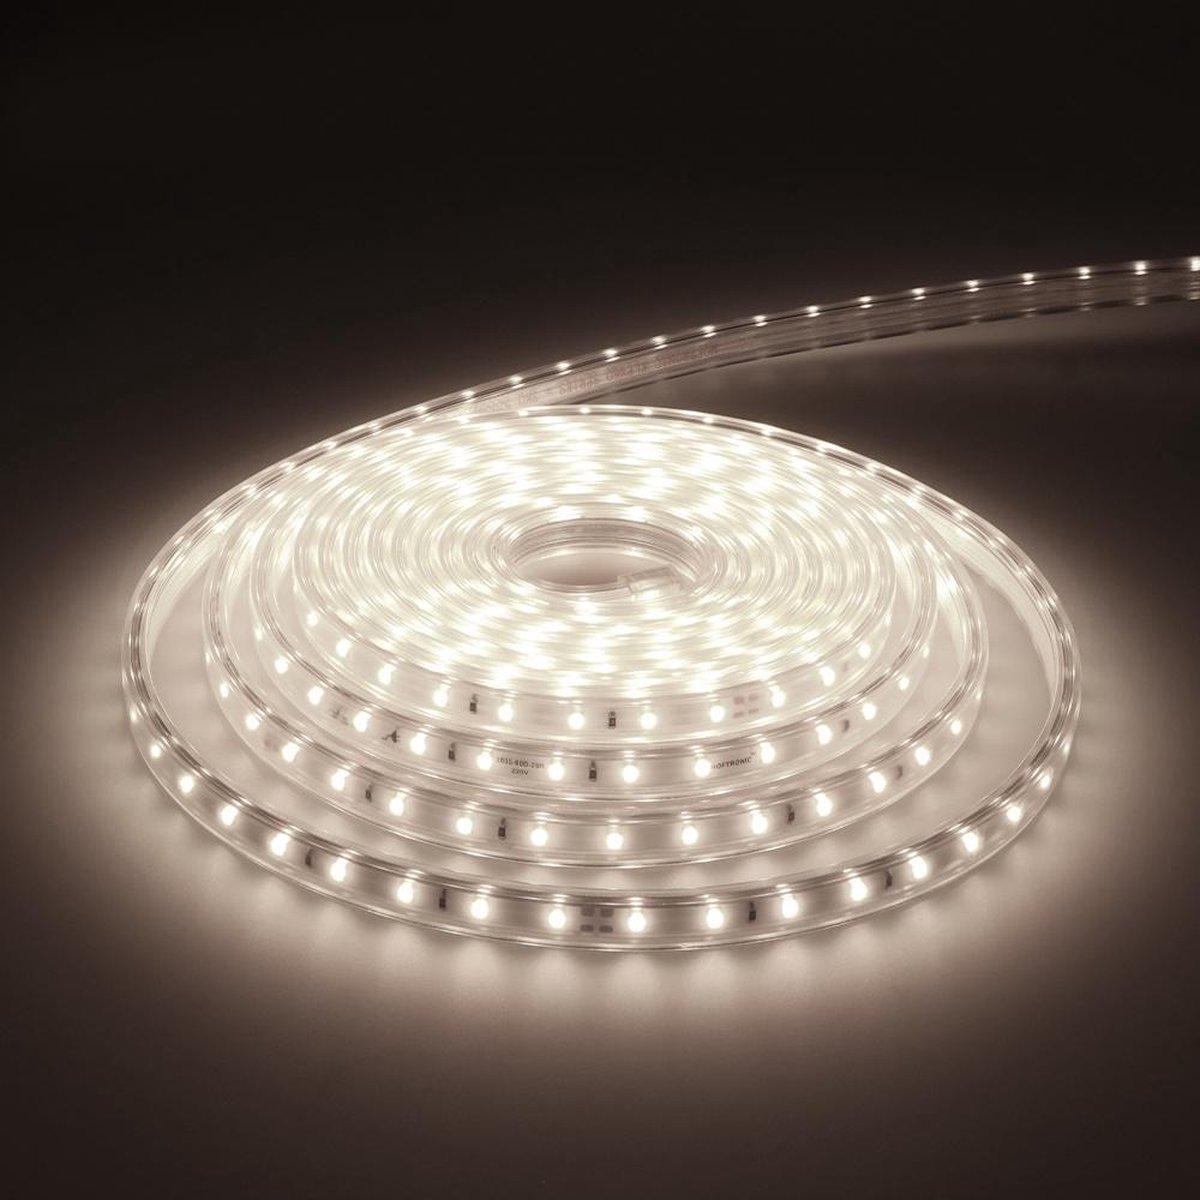 Dimbare LED Strip 5m 6000K 60 LEDs/m IP65 Plug & Play - Flex60 Series